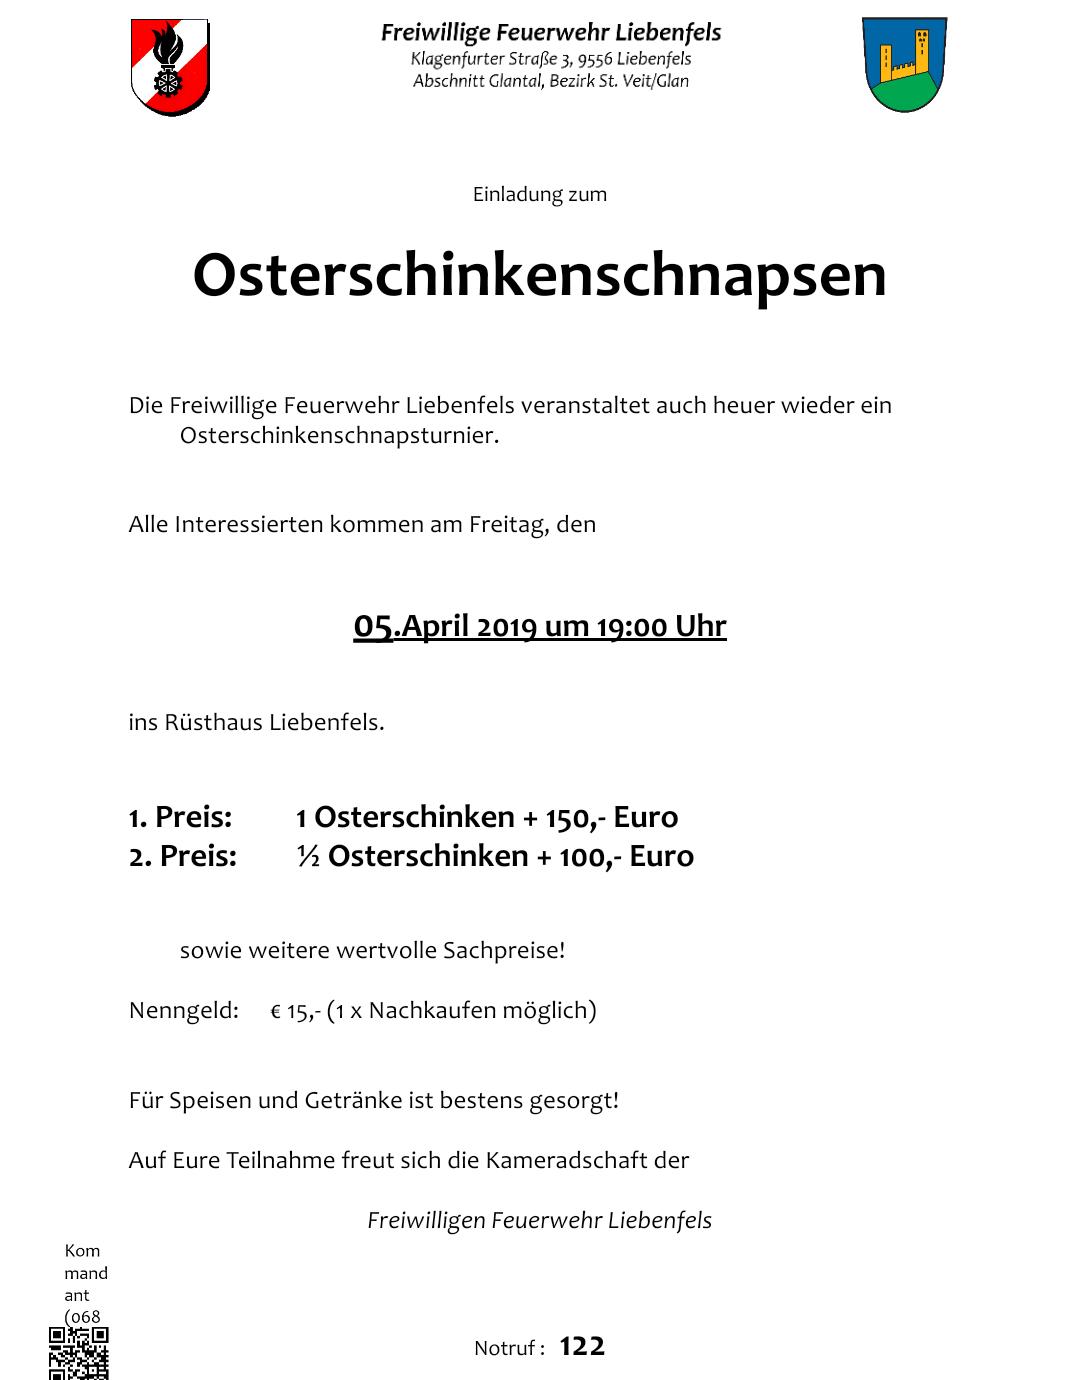 Osterschinkenschnapsen 6.4.2016